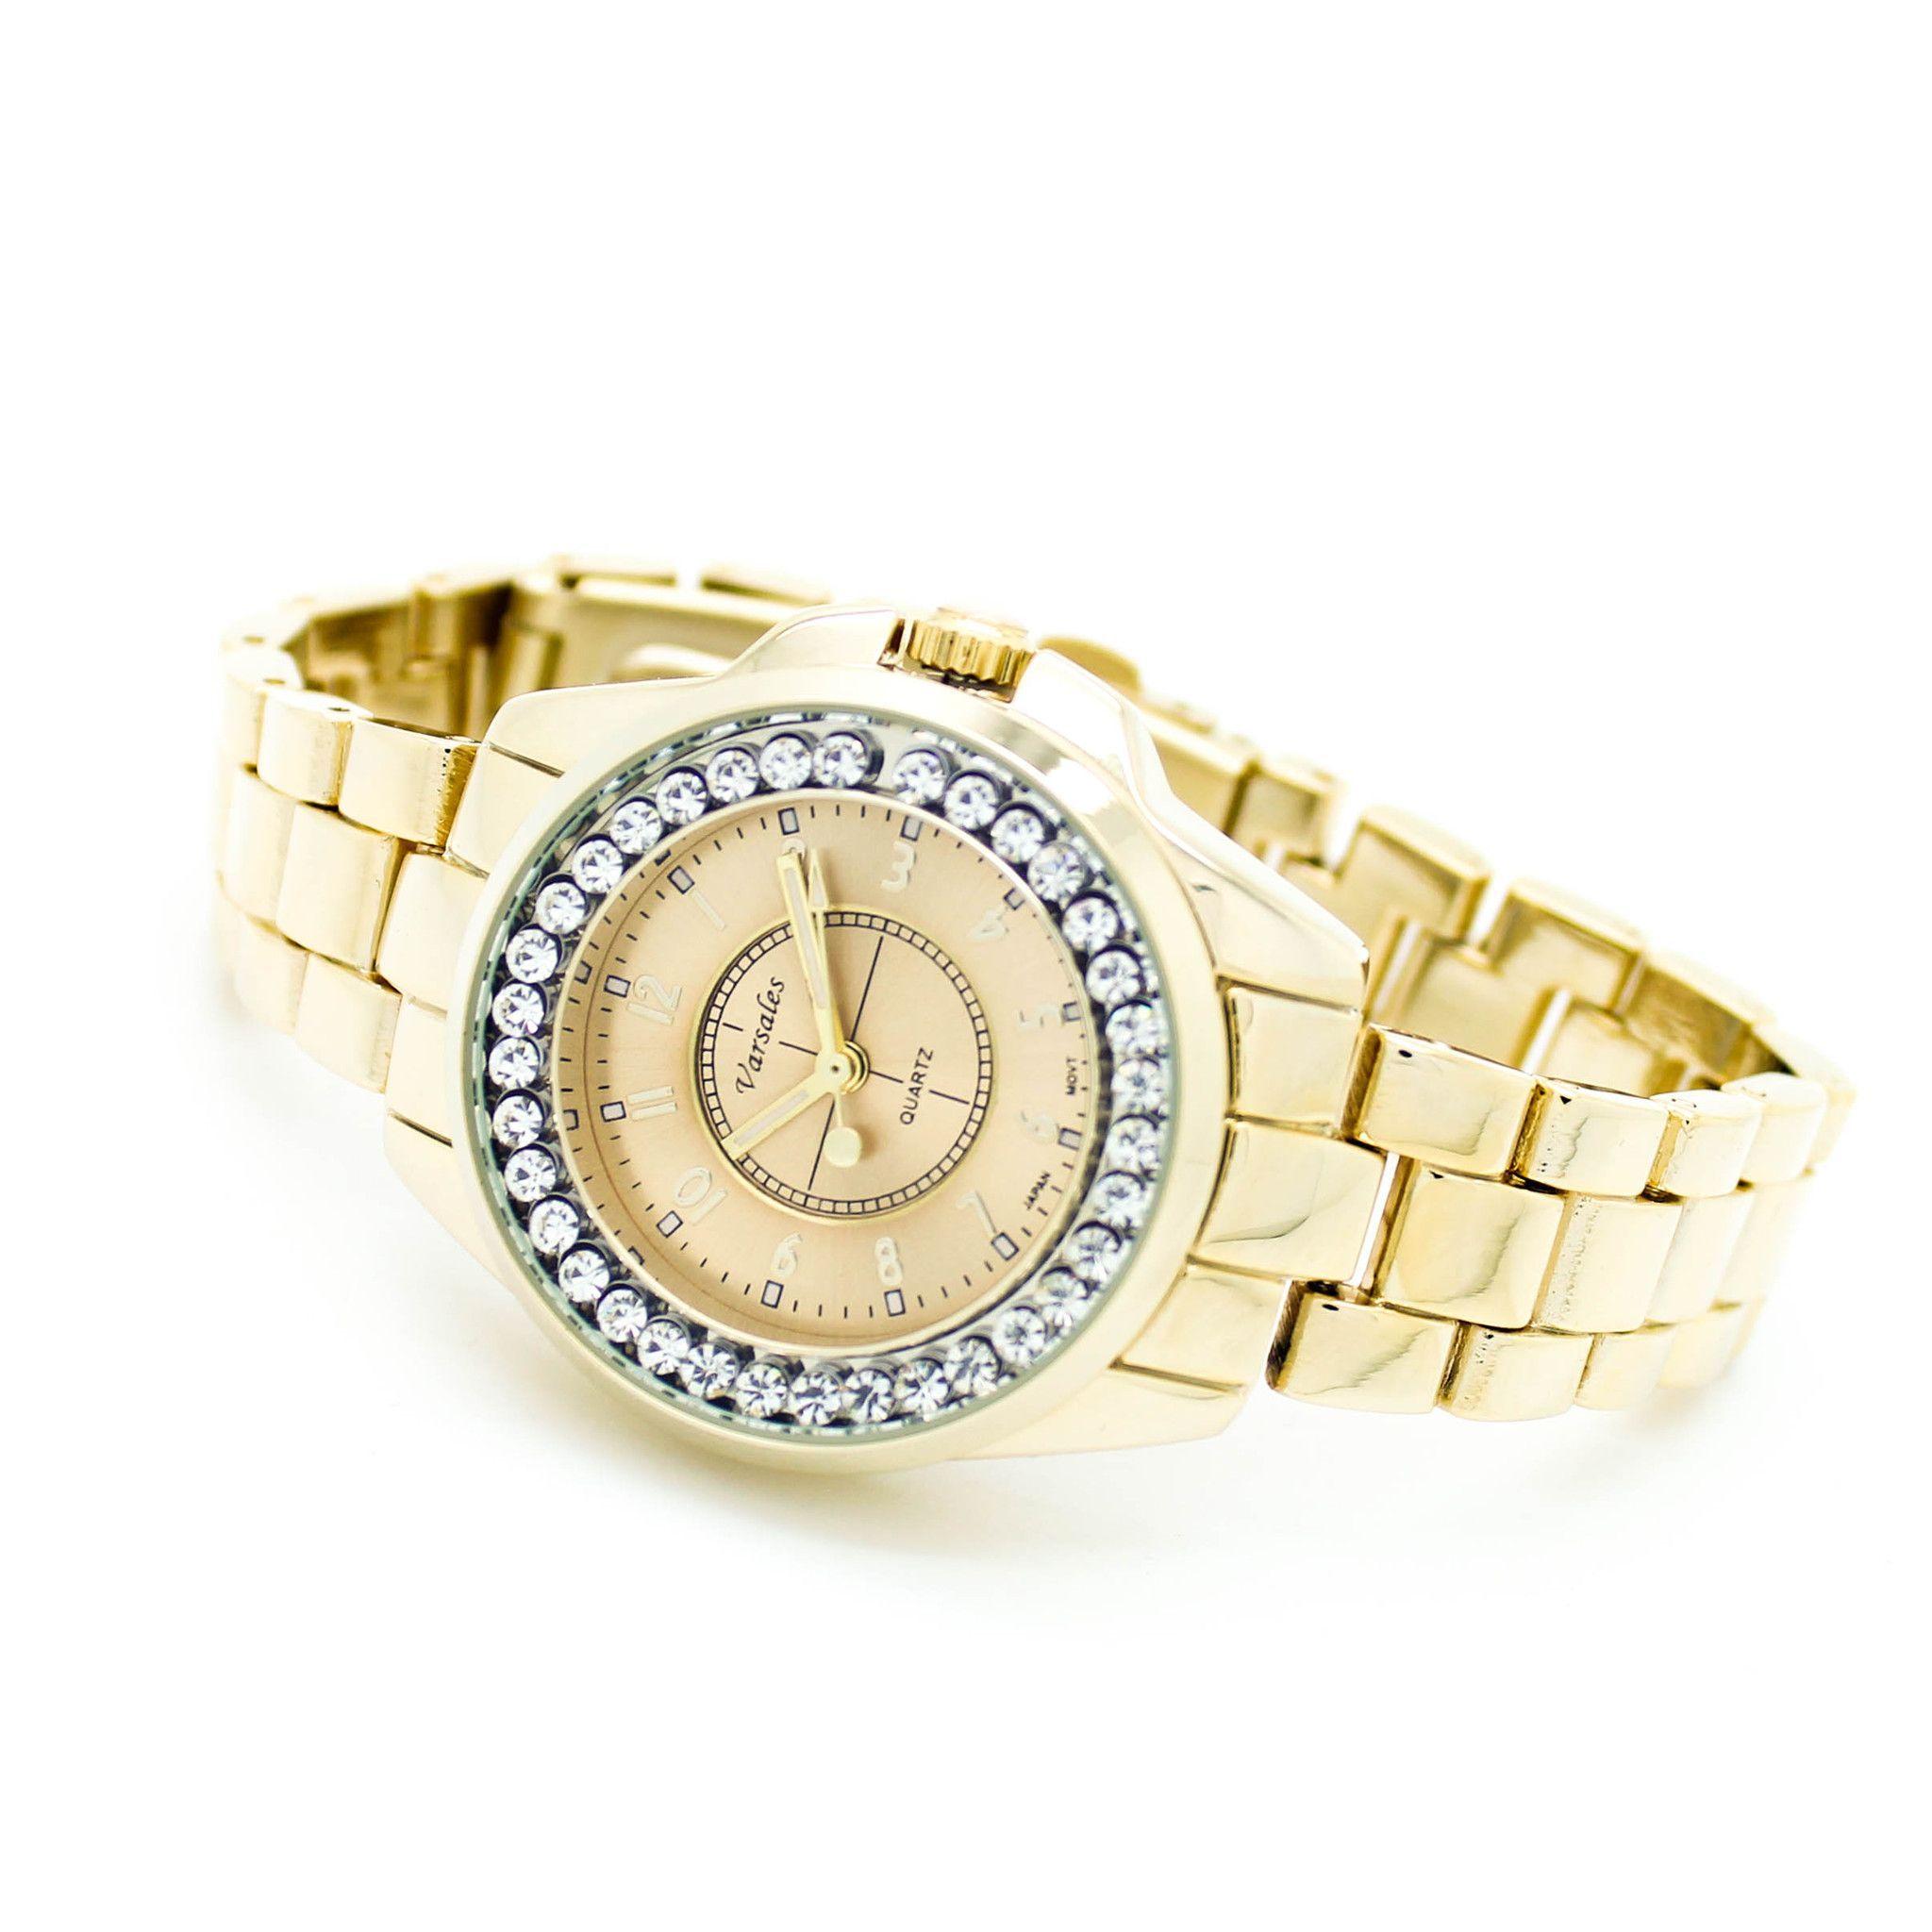 Seaport metal watch (4 colors)